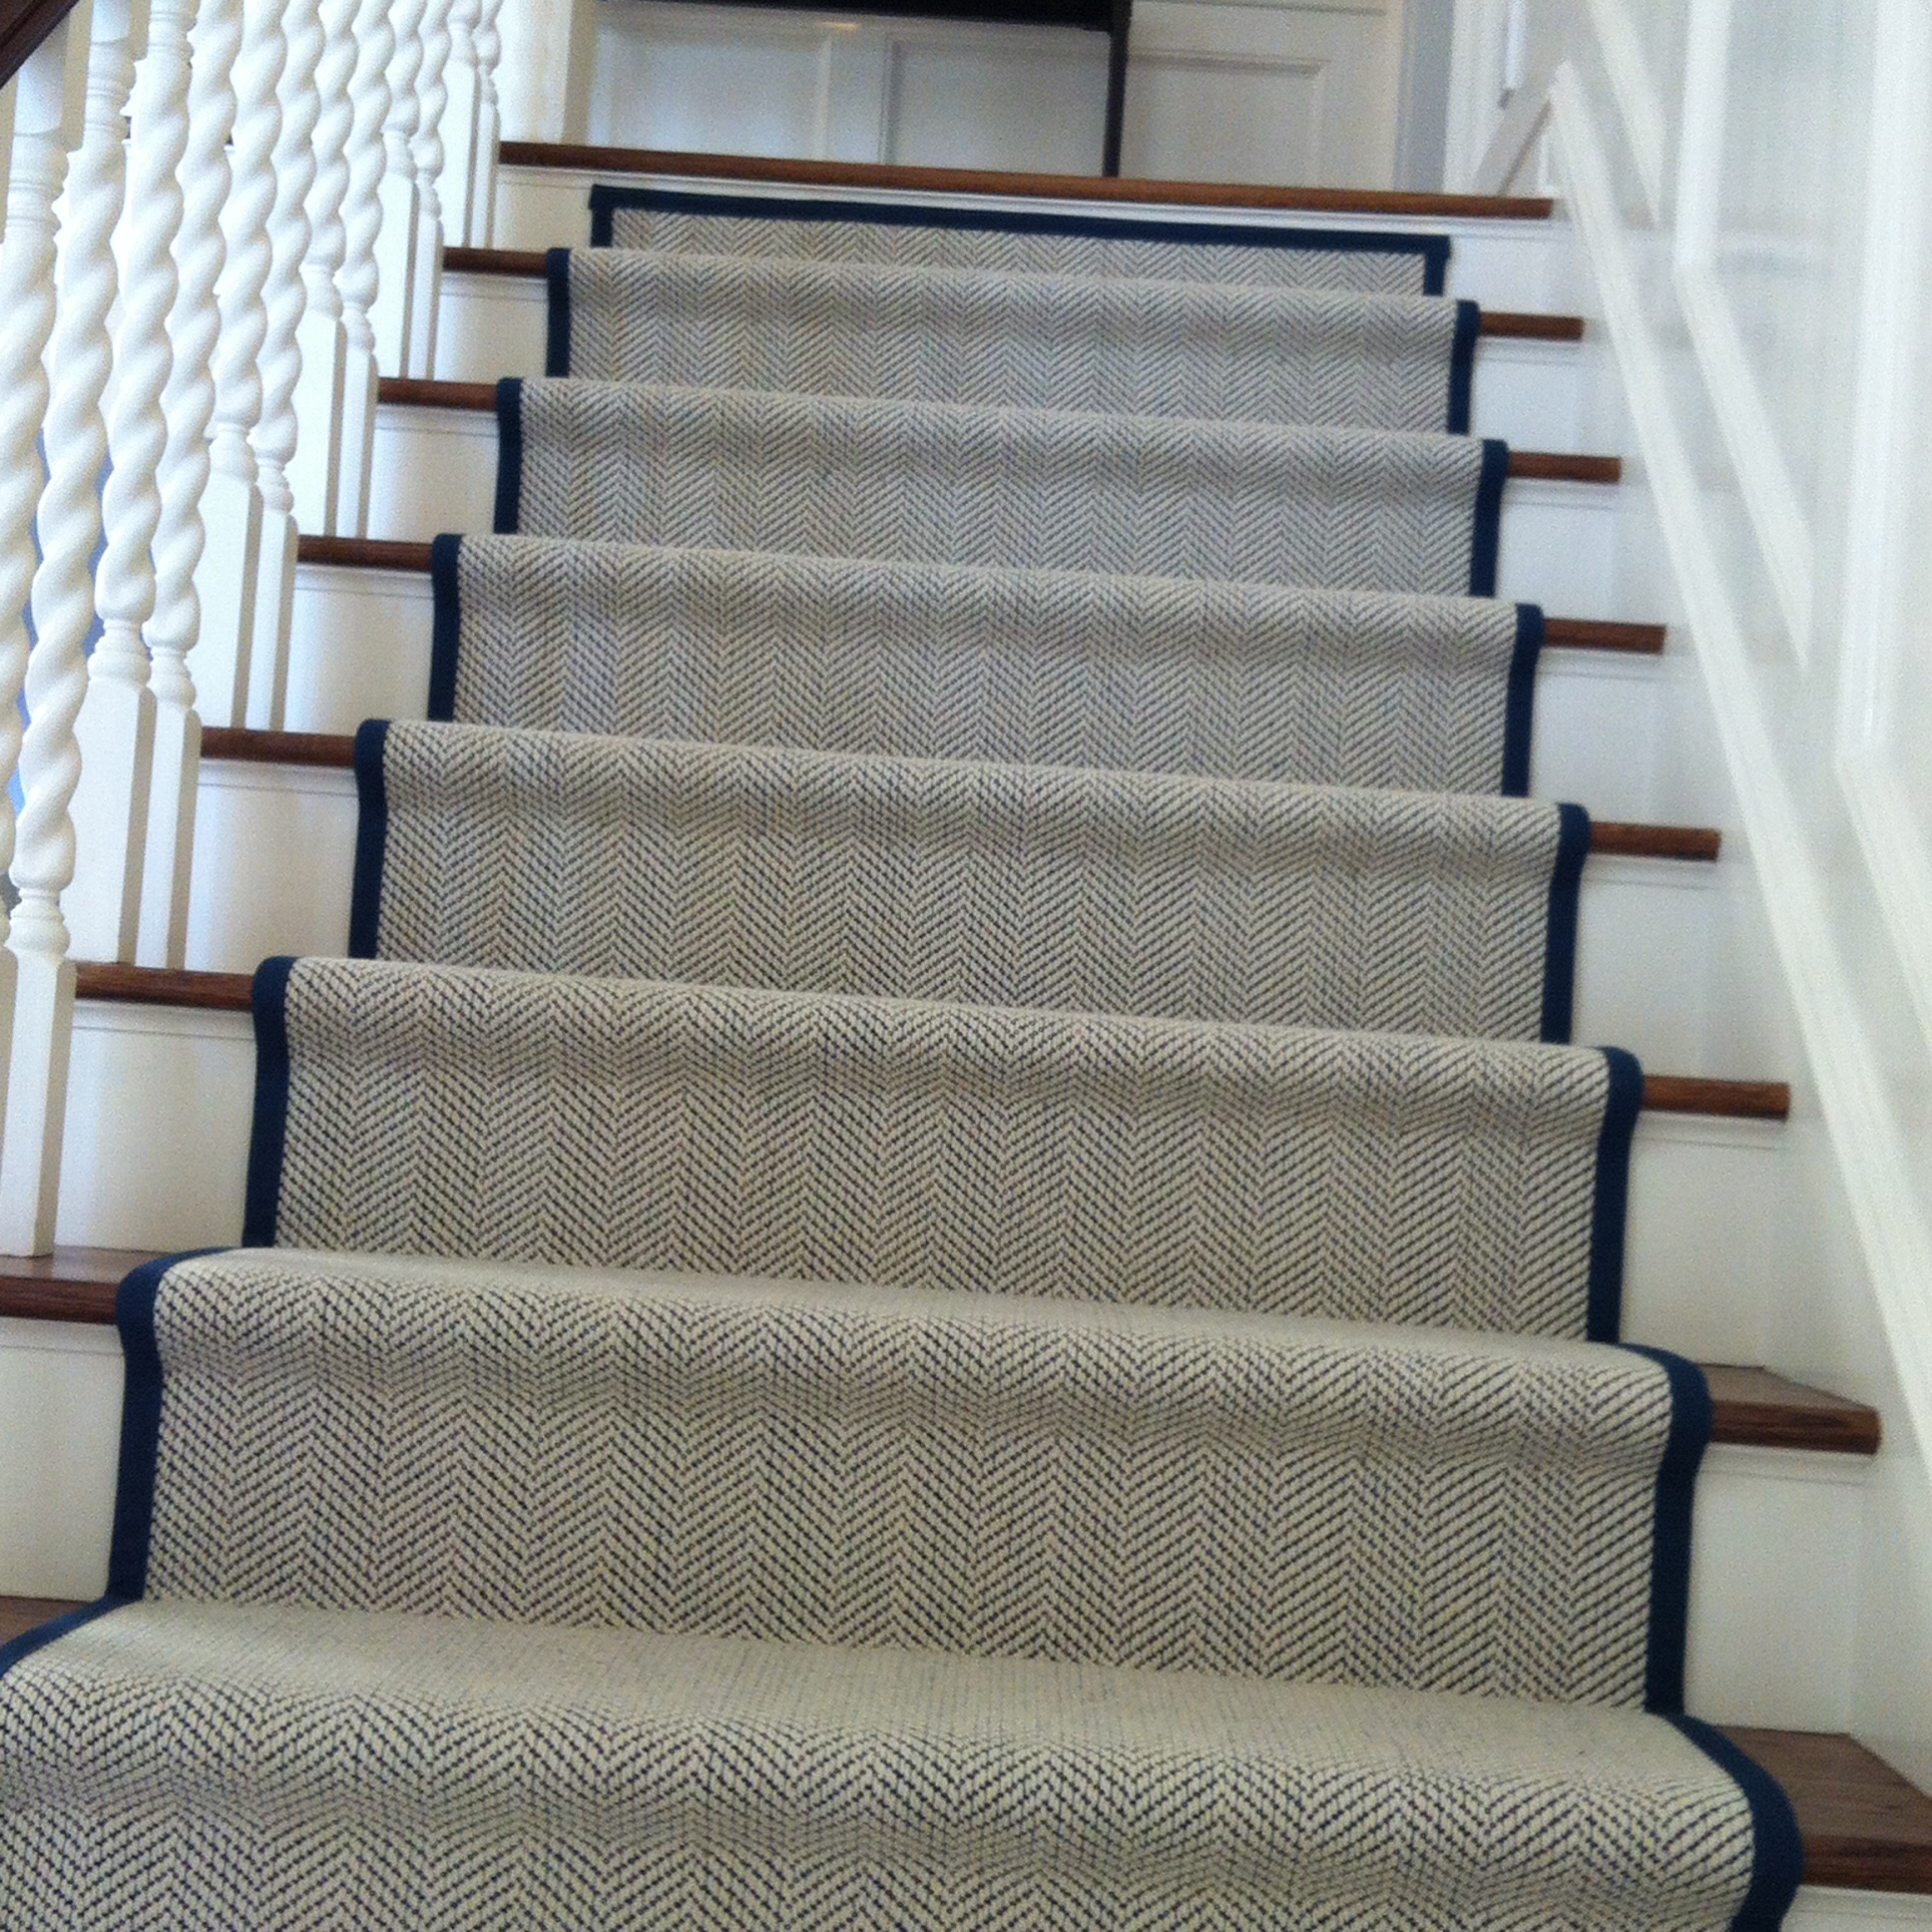 Area Rugs Startling Tahari Rugs Tahari Home Bathroom Rugs With Stair And Hallway Runners (View 14 of 20)